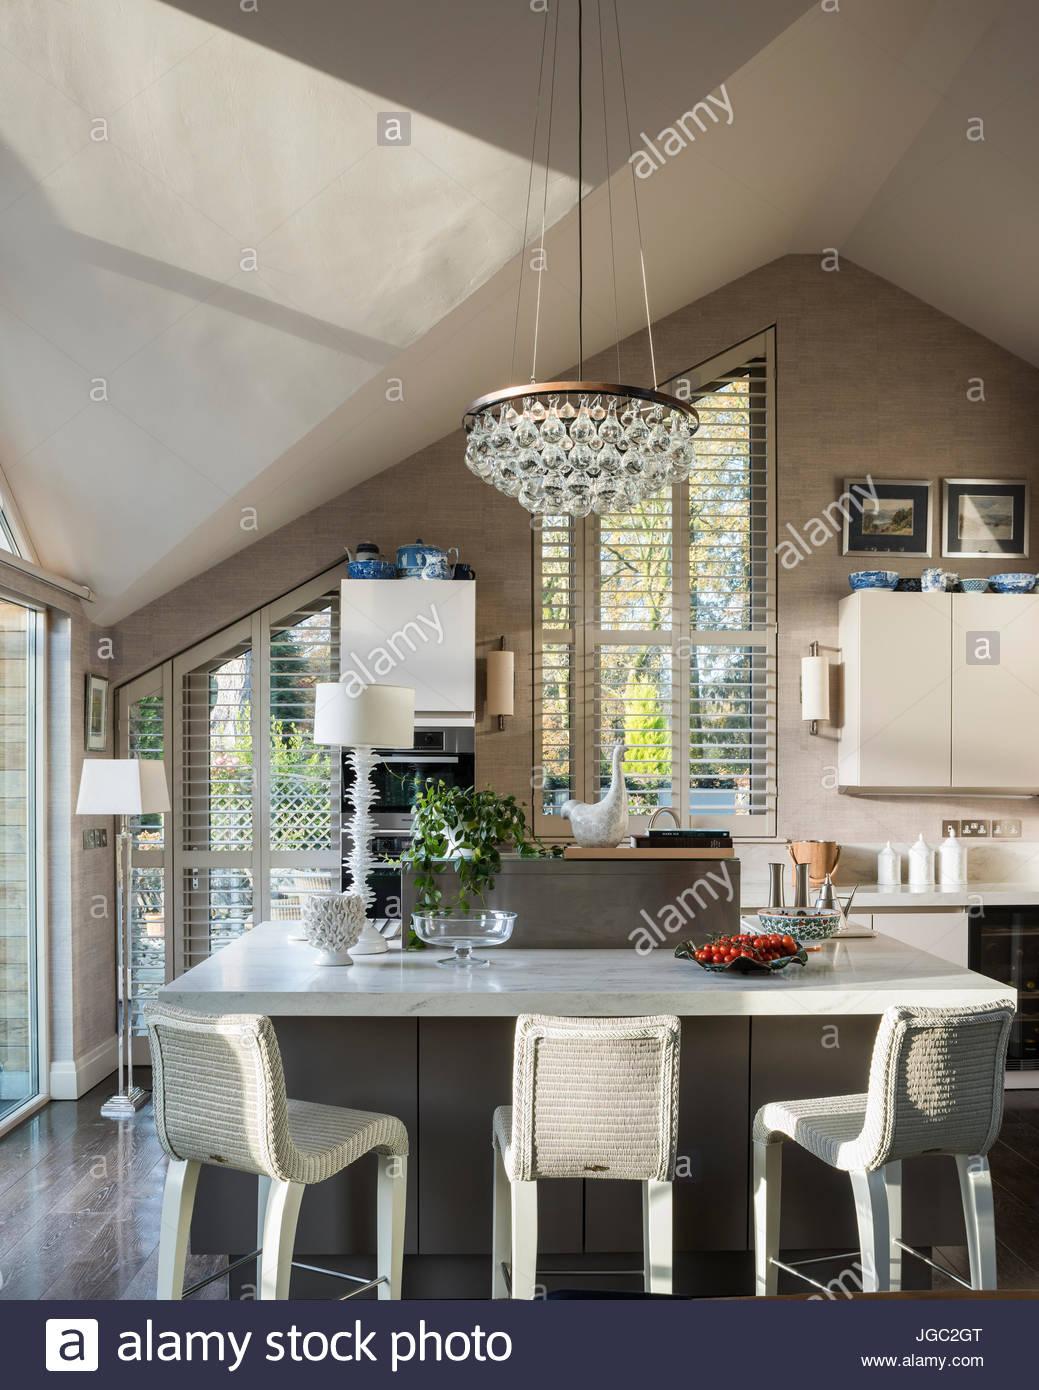 Glühbirne Anhänger über Frühstücksbar in a-förmige Küche Stockbild